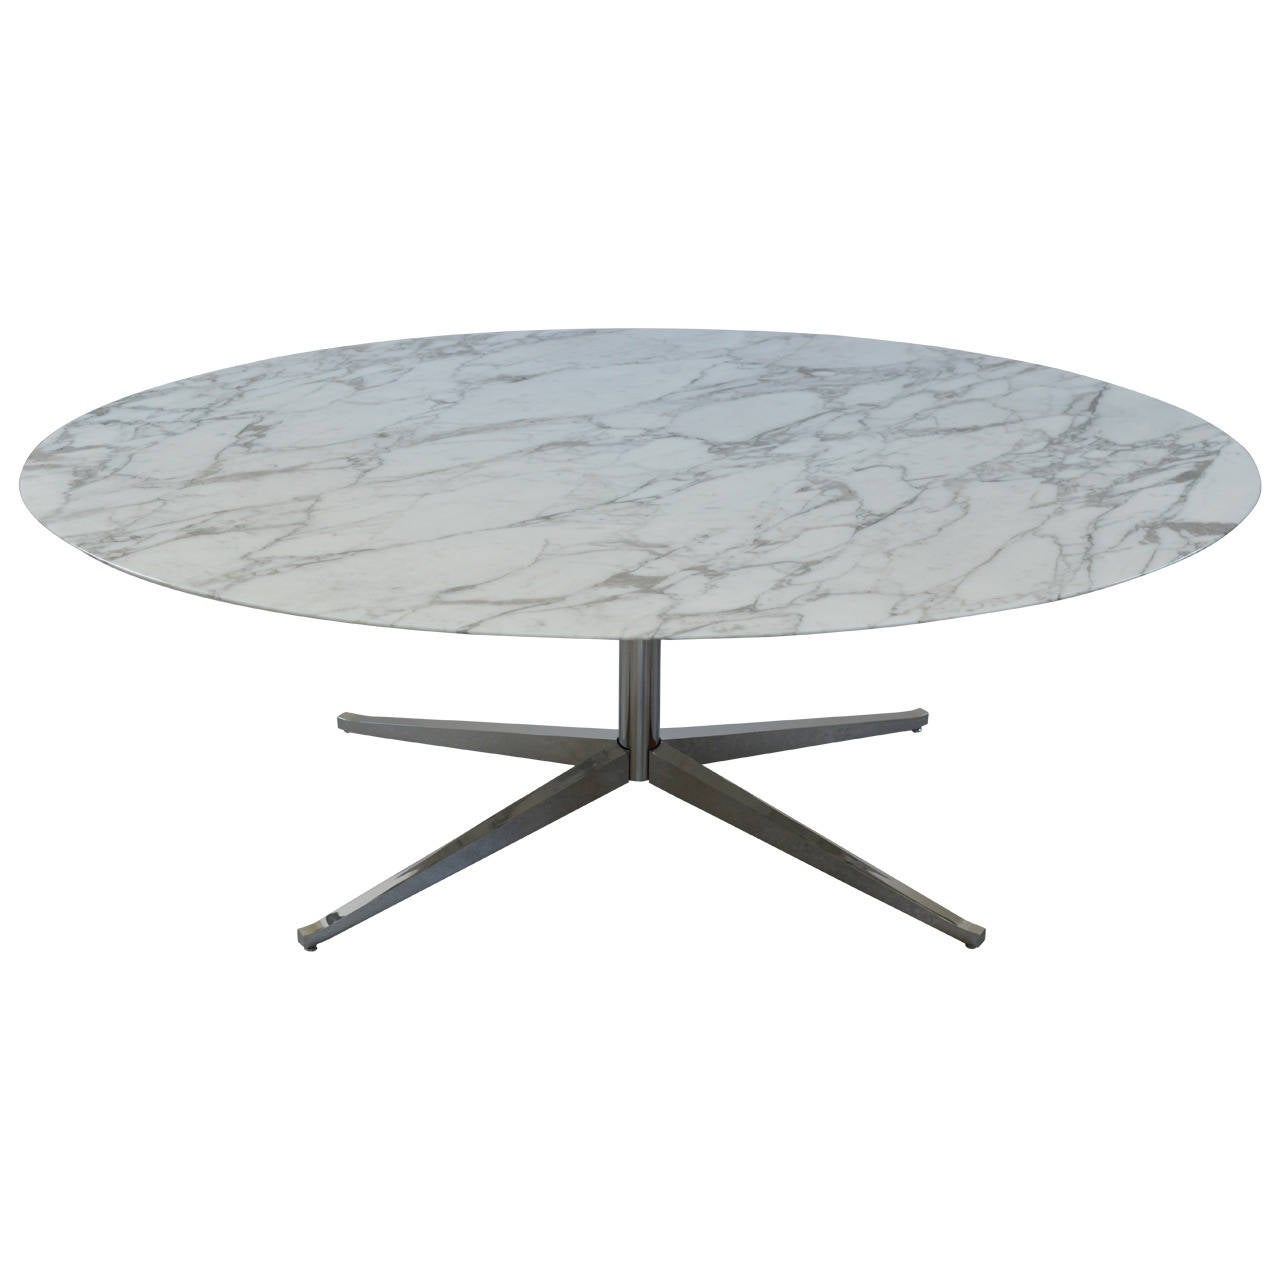 table knoll ovale marbre id e inspirante pour la conception de la maison. Black Bedroom Furniture Sets. Home Design Ideas